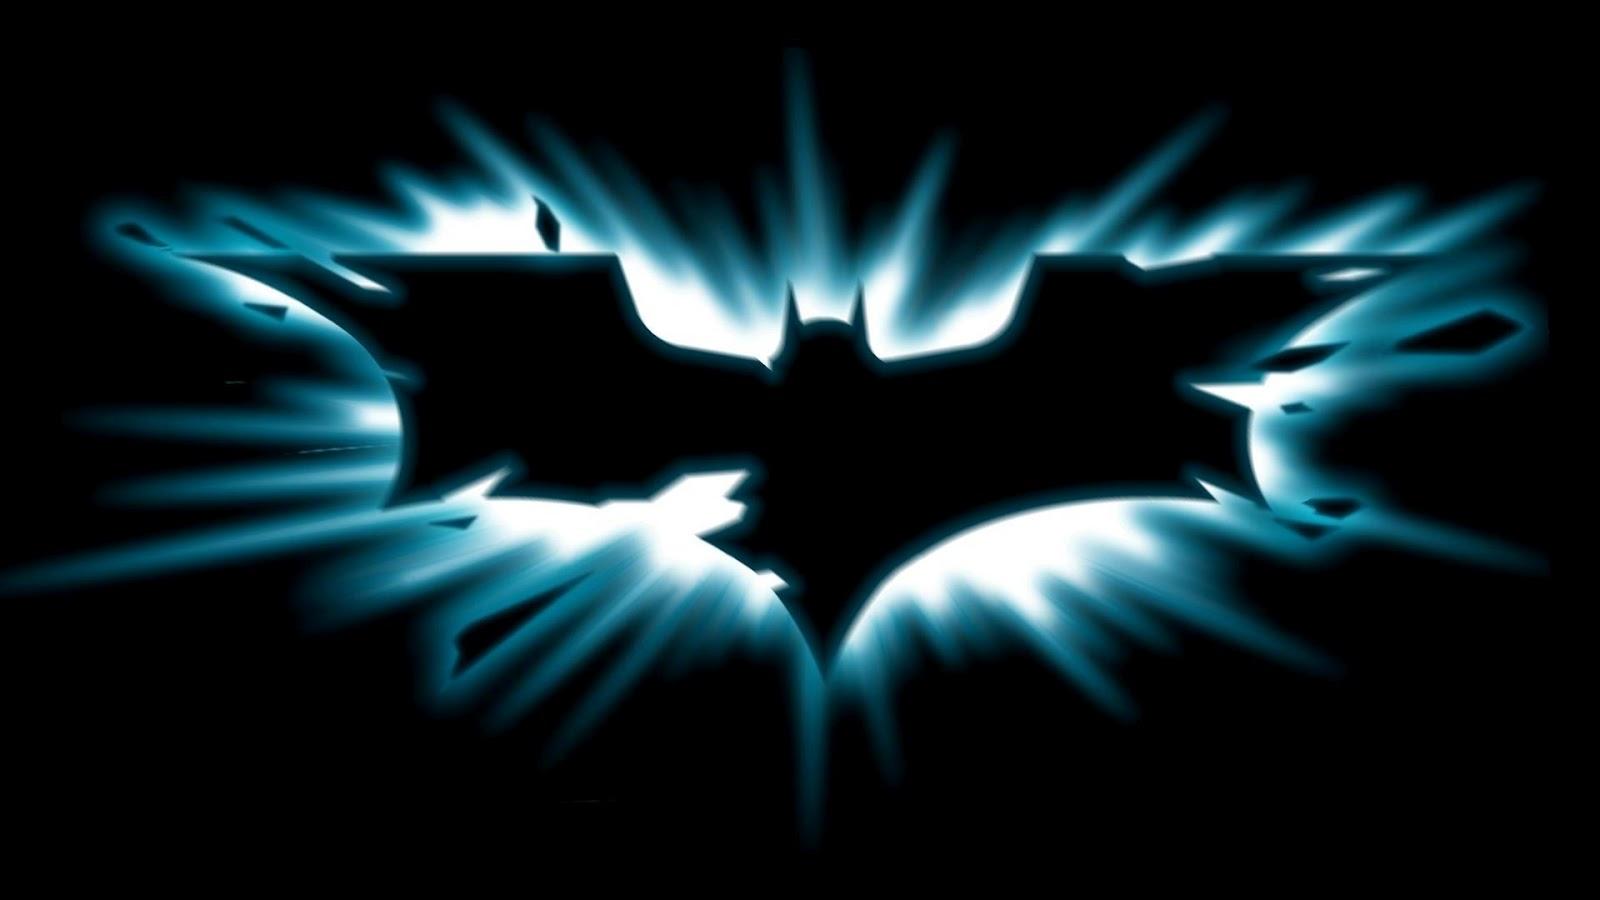 Batman Movies Wallpapers Wallpaper amp Pictures 1600x900